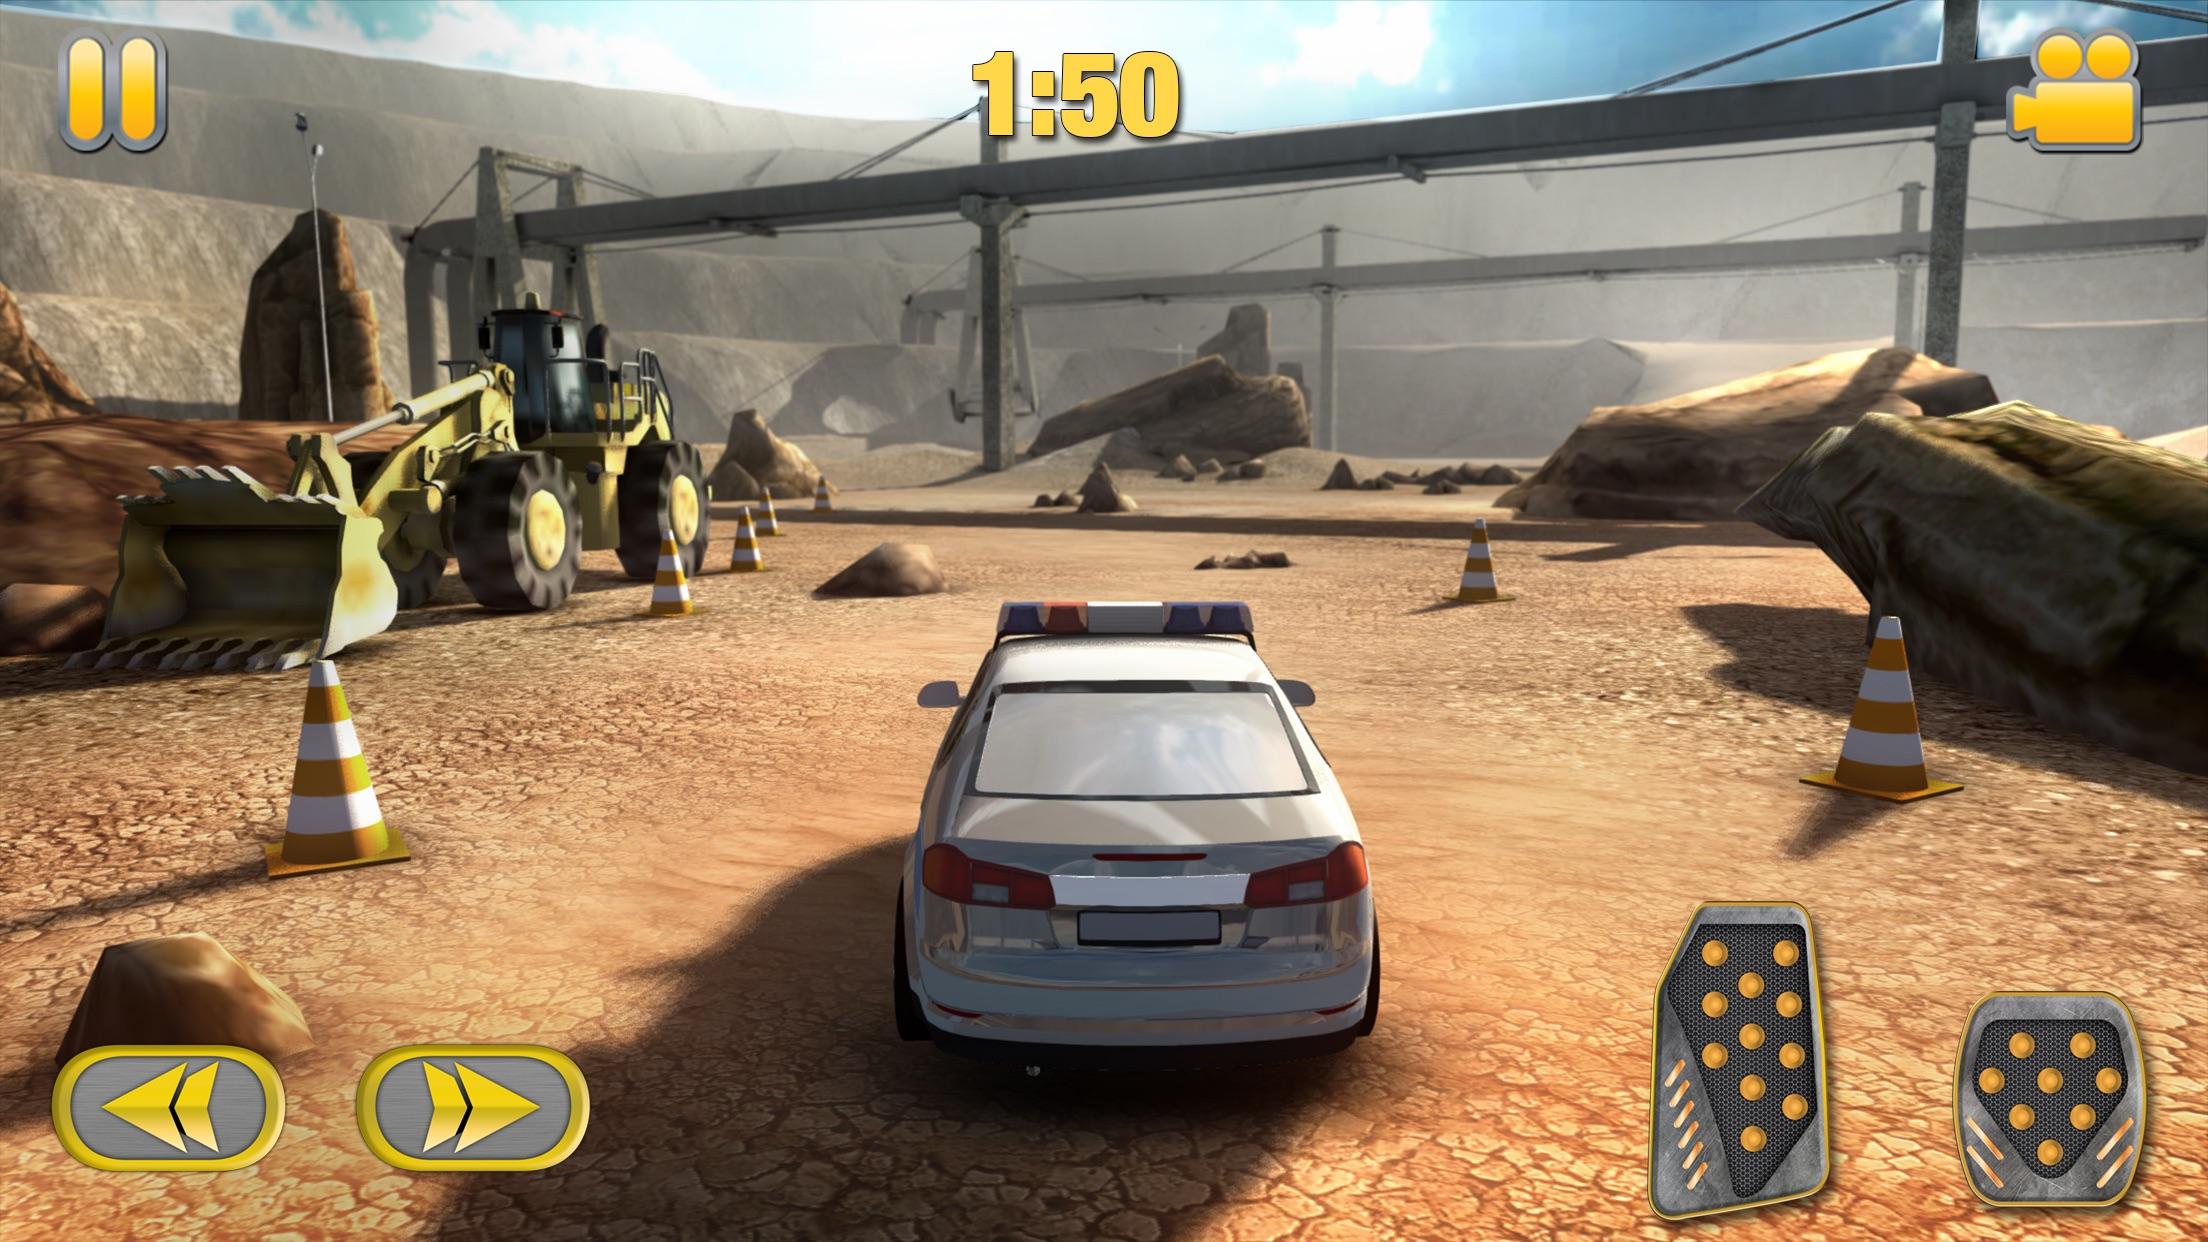 Car Parking Test - Realistic Driving Simulation Screenshot